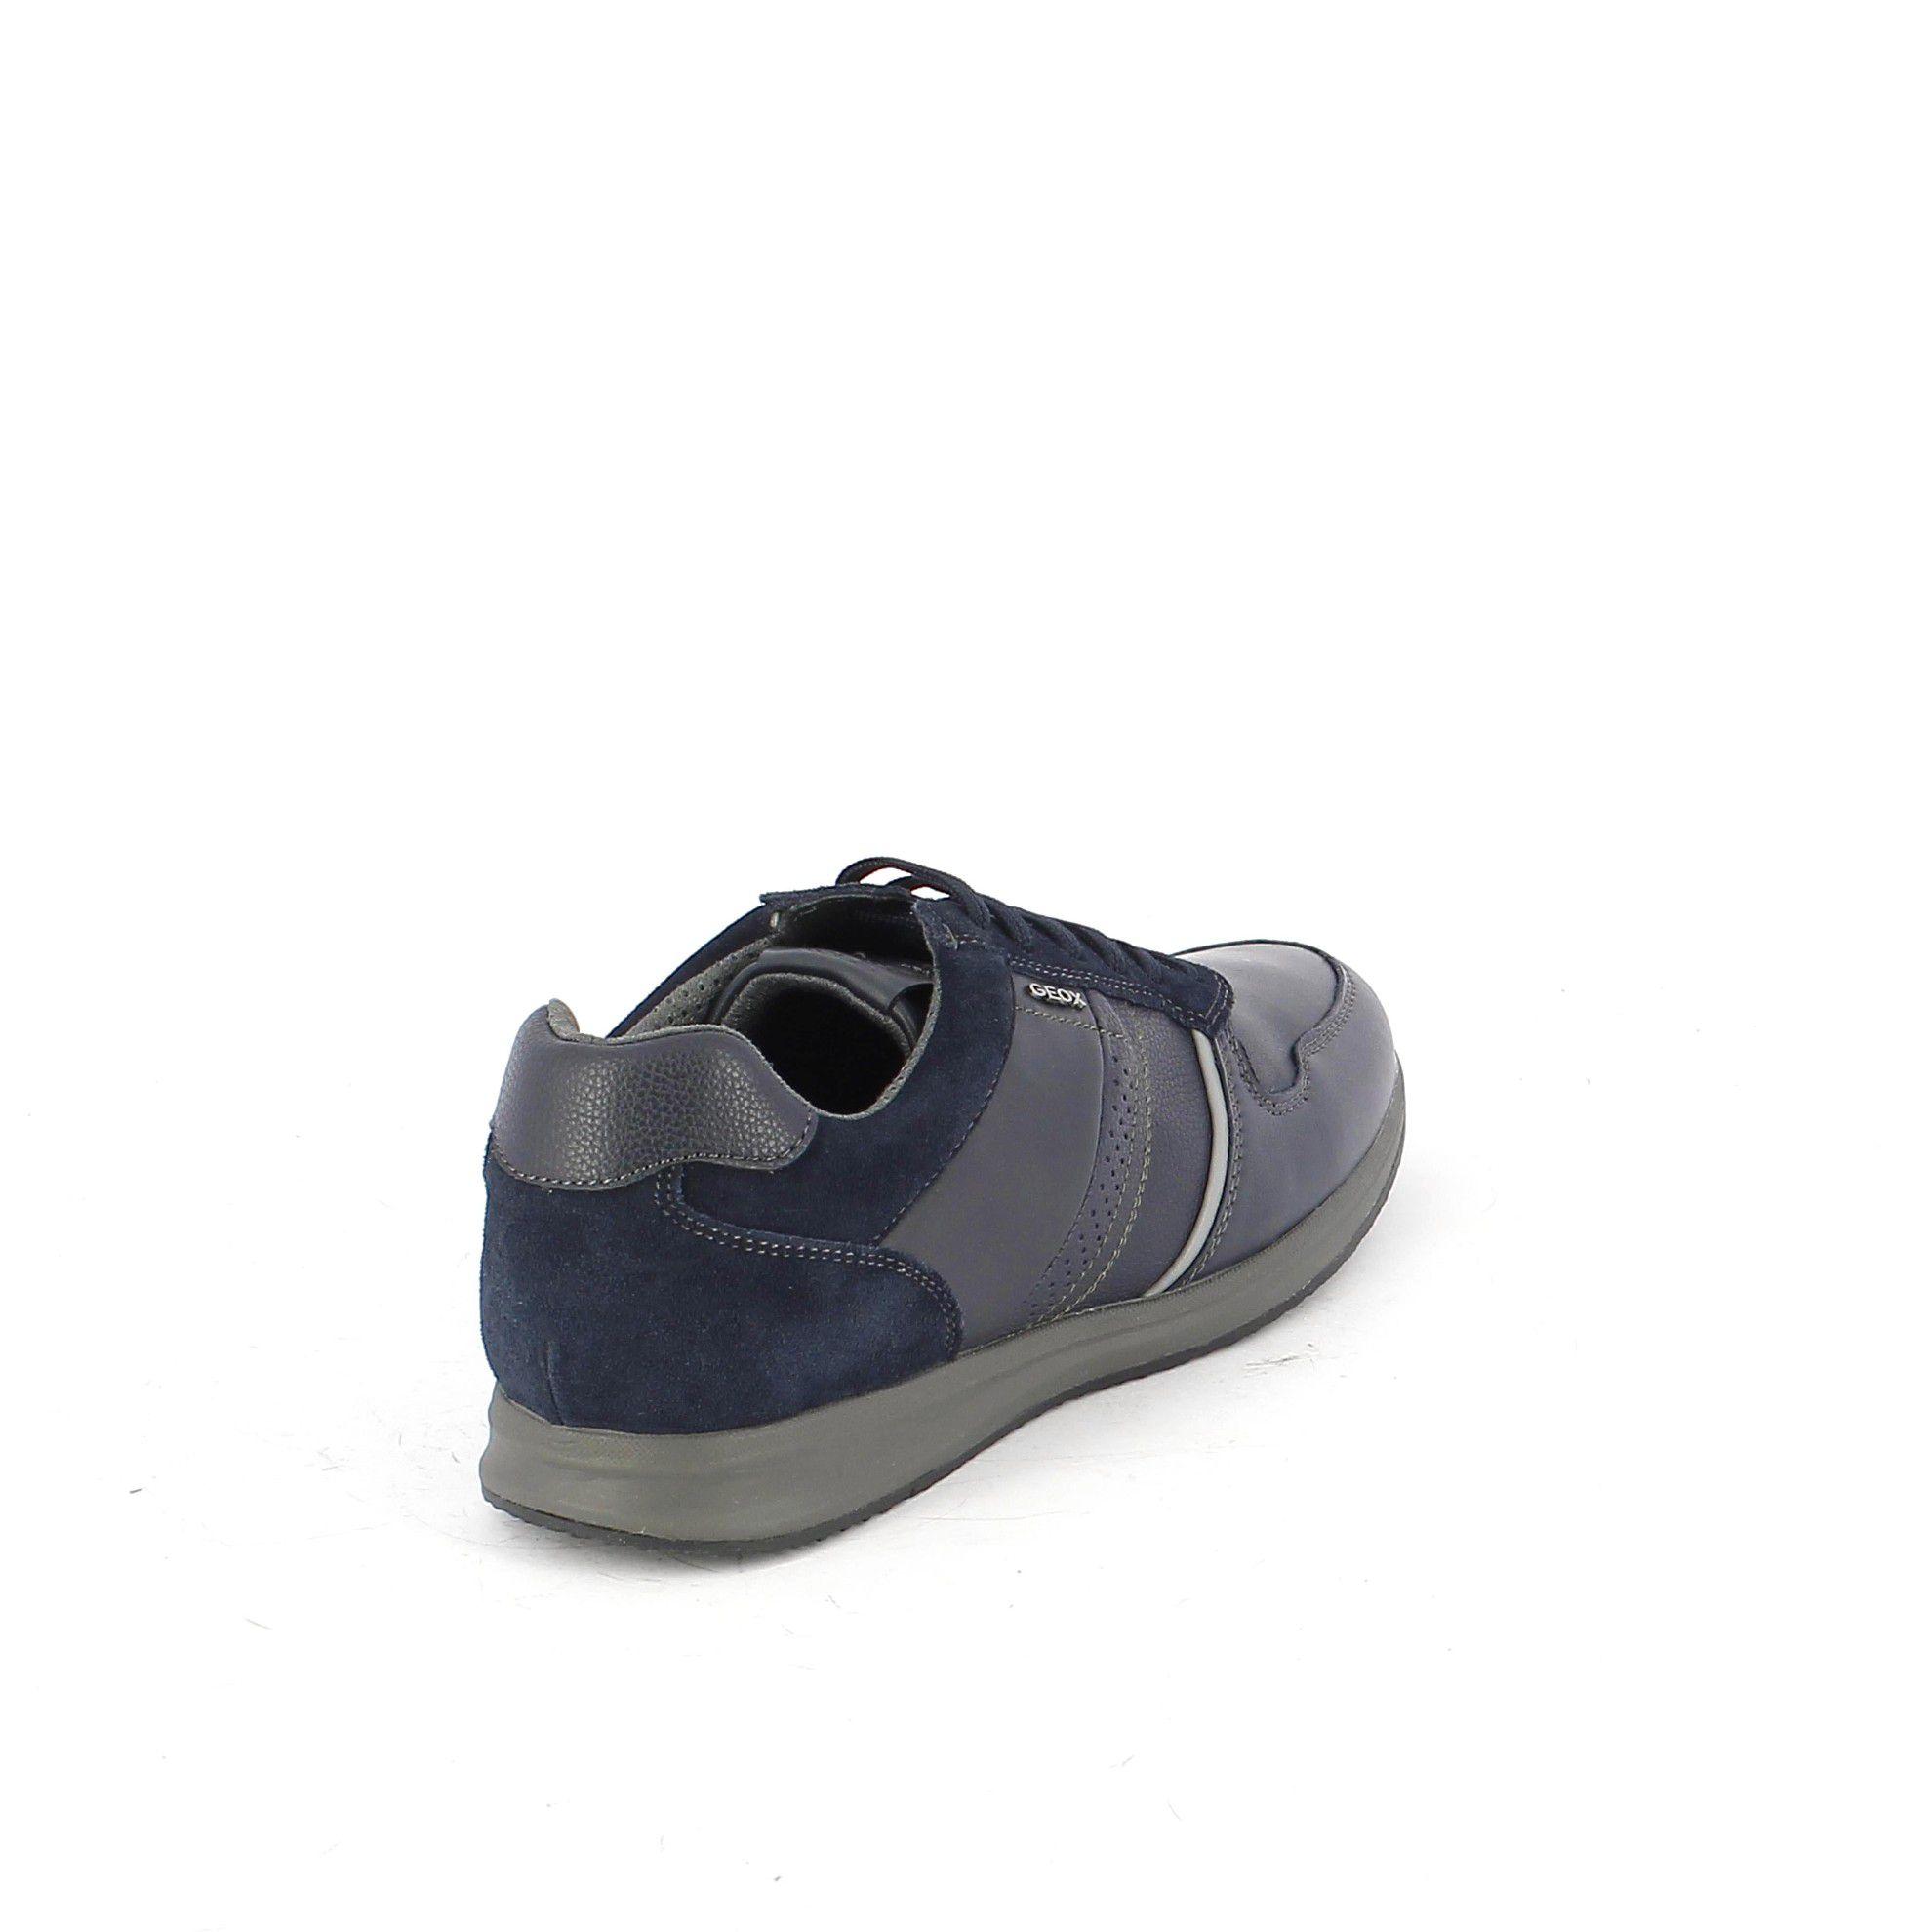 Geox sneaker avery a in nappa e suede da uomo